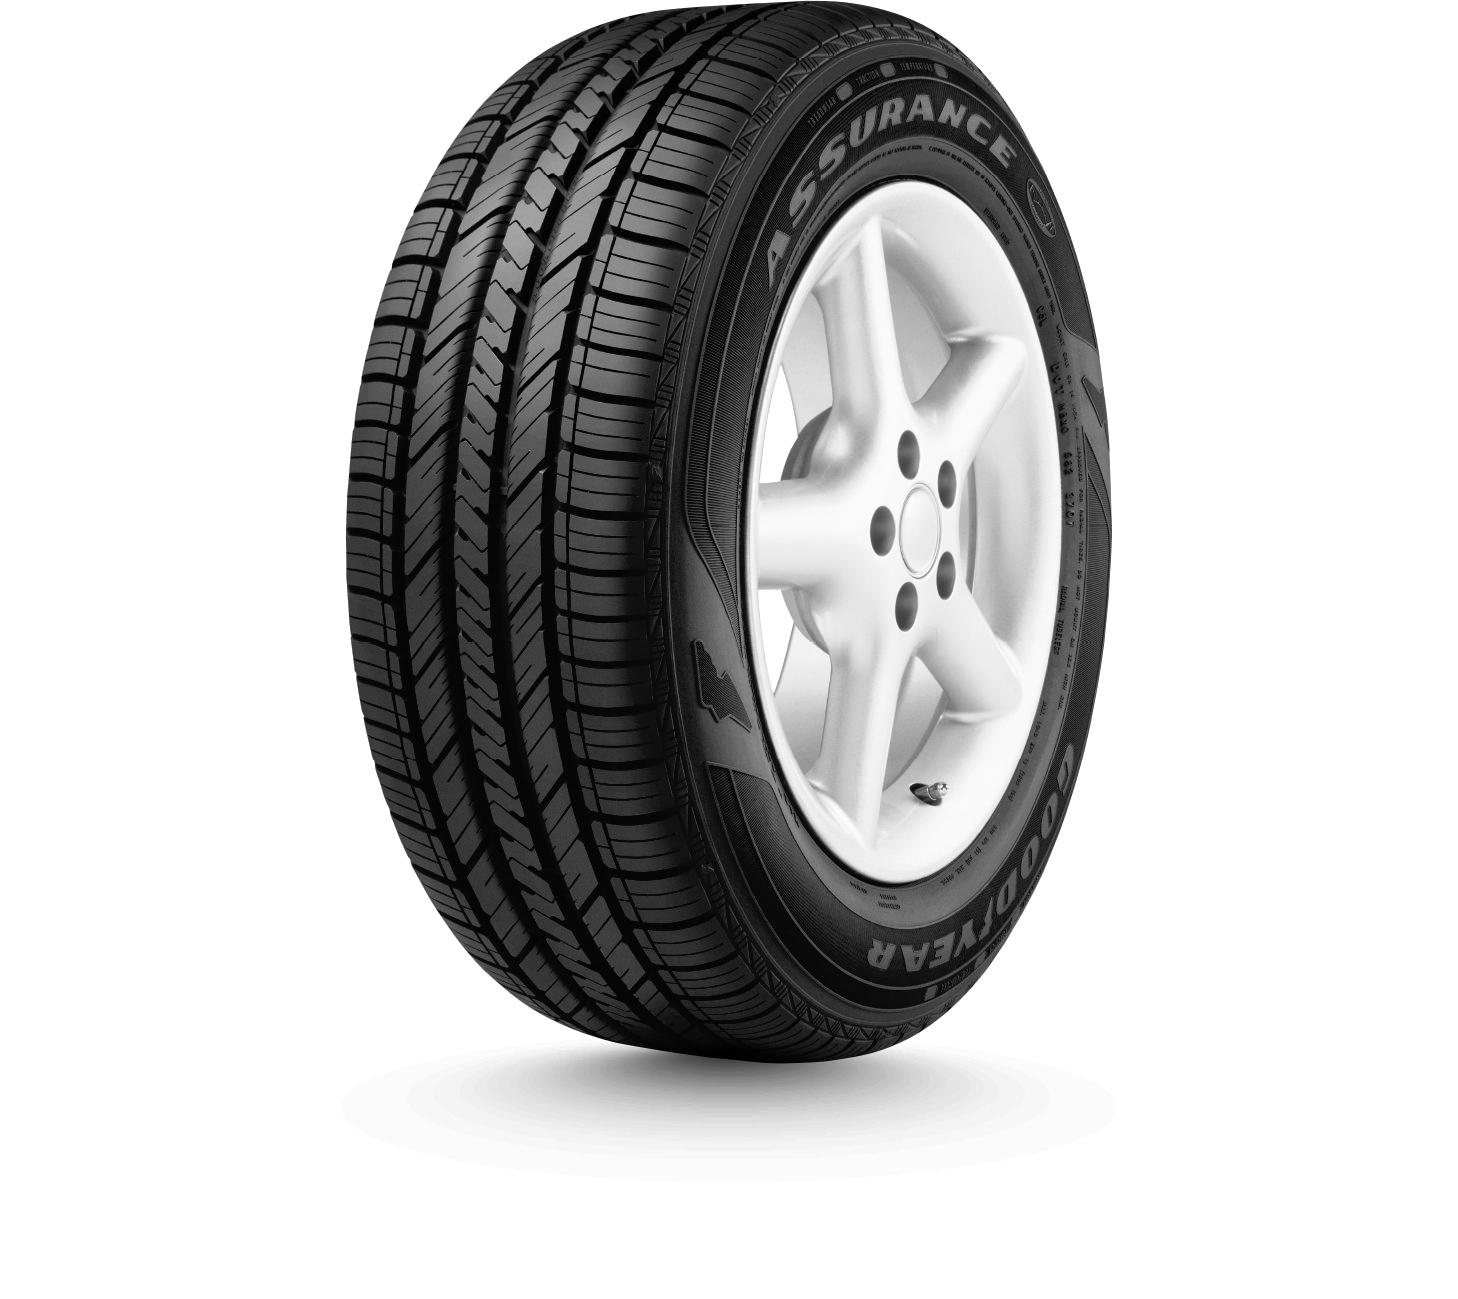 Goodyear Assurance® Fuel Max®